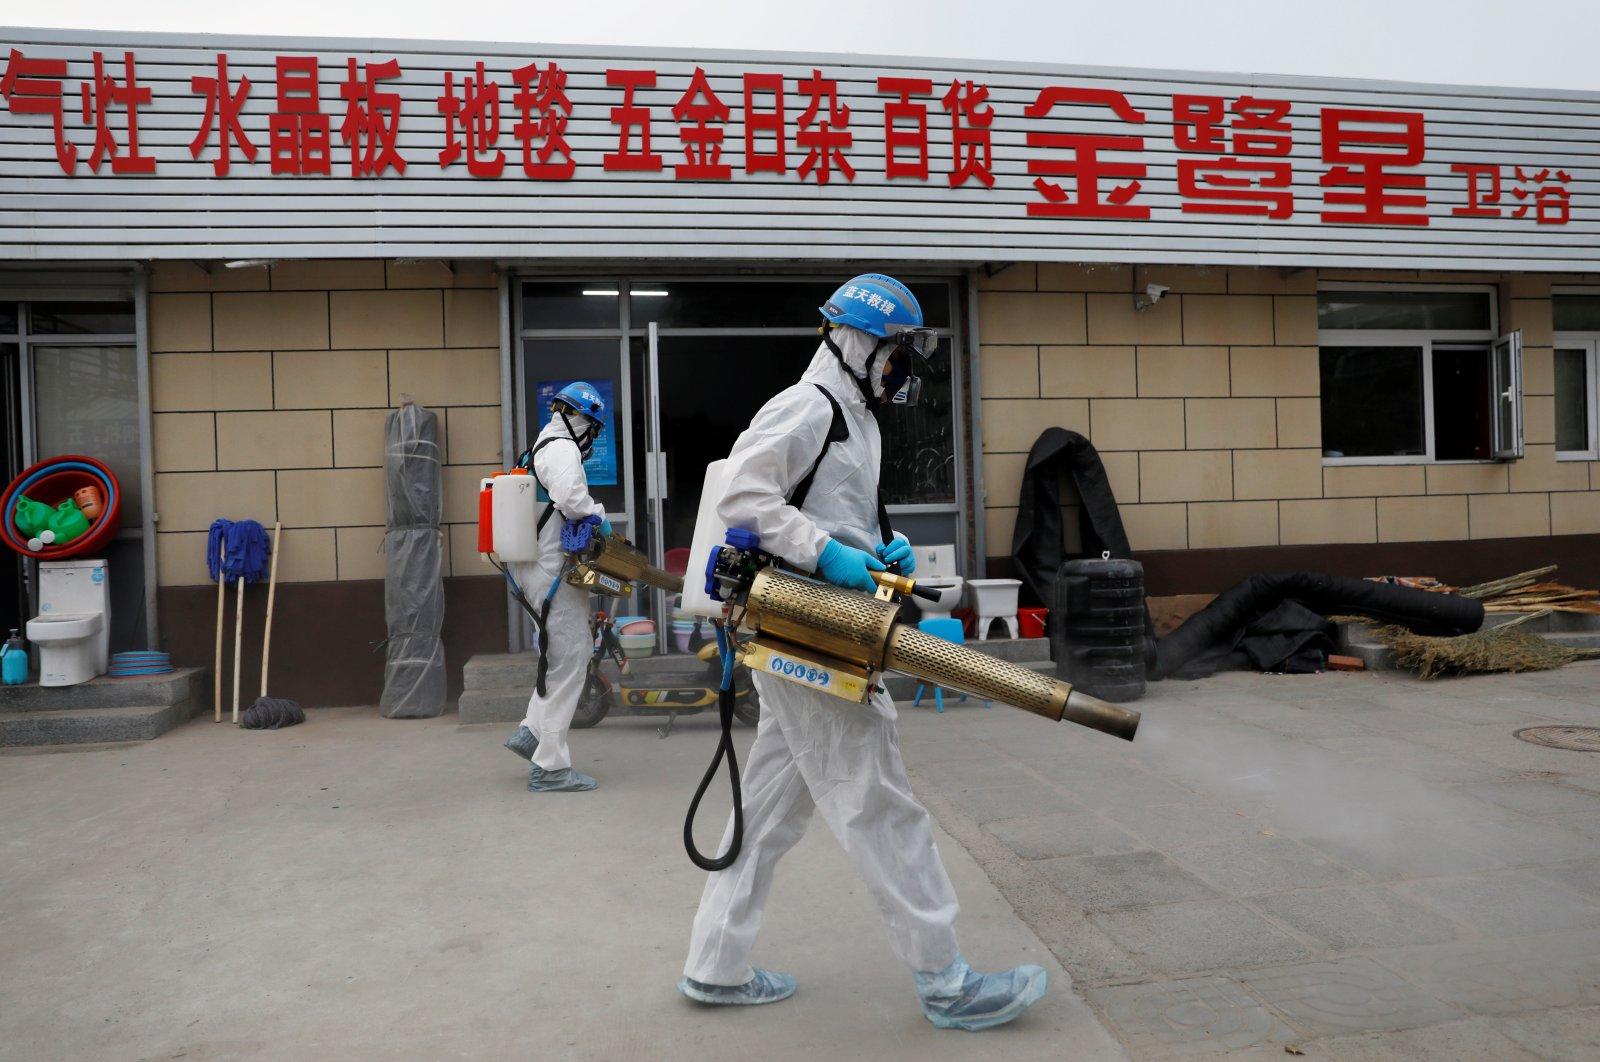 Volunteers in protective suits disinfect the Nangong comprehensive market, Beijing, China, June 18, 2020. (Reuters Photo)